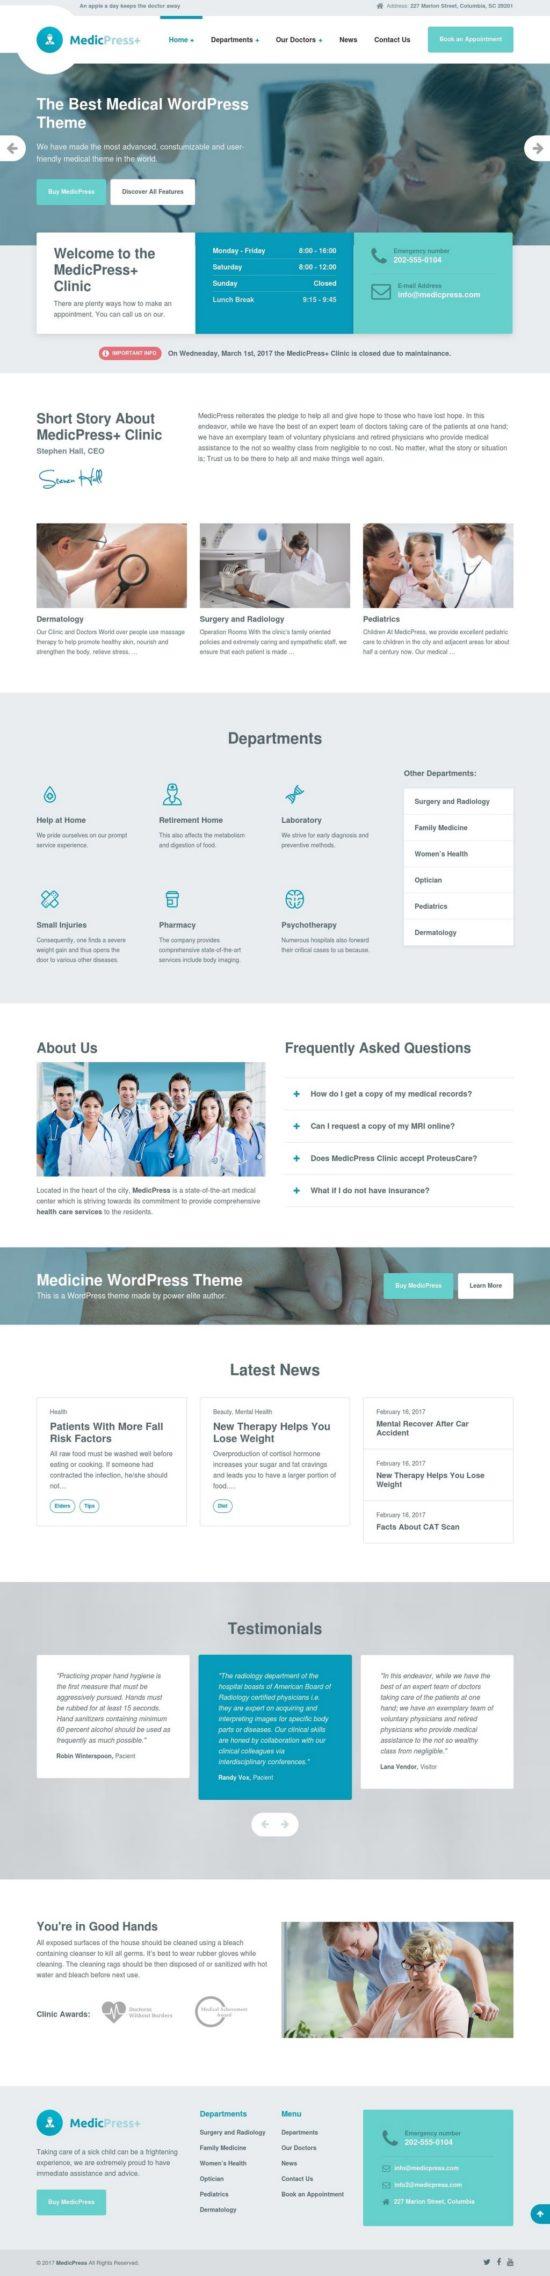 medicpress proteusthemes wordpress theme 01 550x2276 - MedicPress WordPress Theme